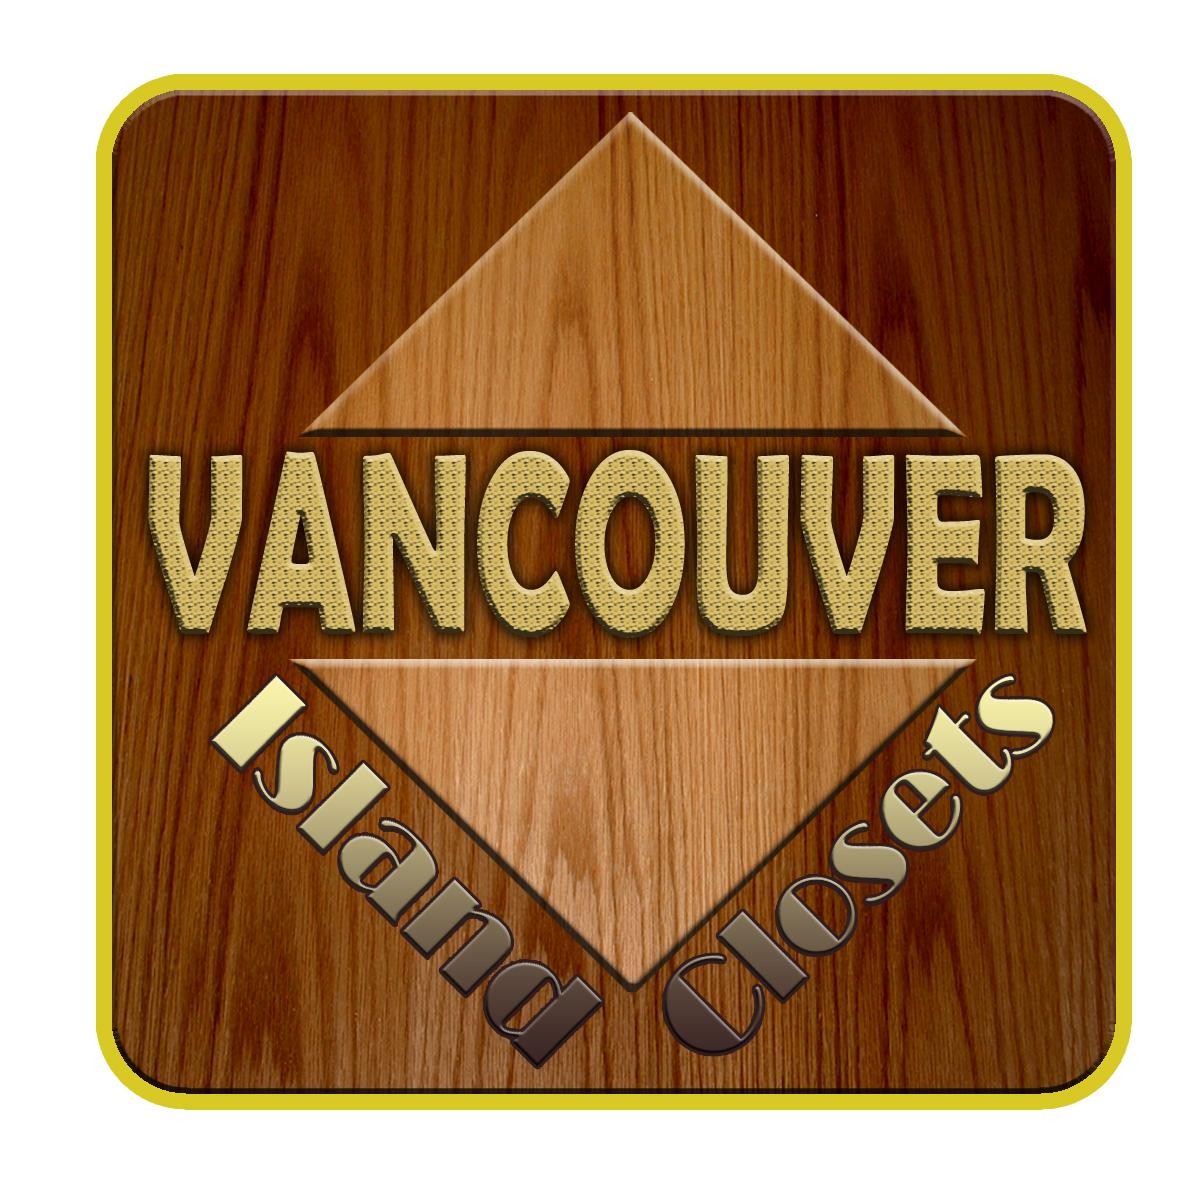 Logo Design by Kitz Malinao - Entry No. 82 in the Logo Design Contest Captivating Logo Design for Vancouver Island Closets.